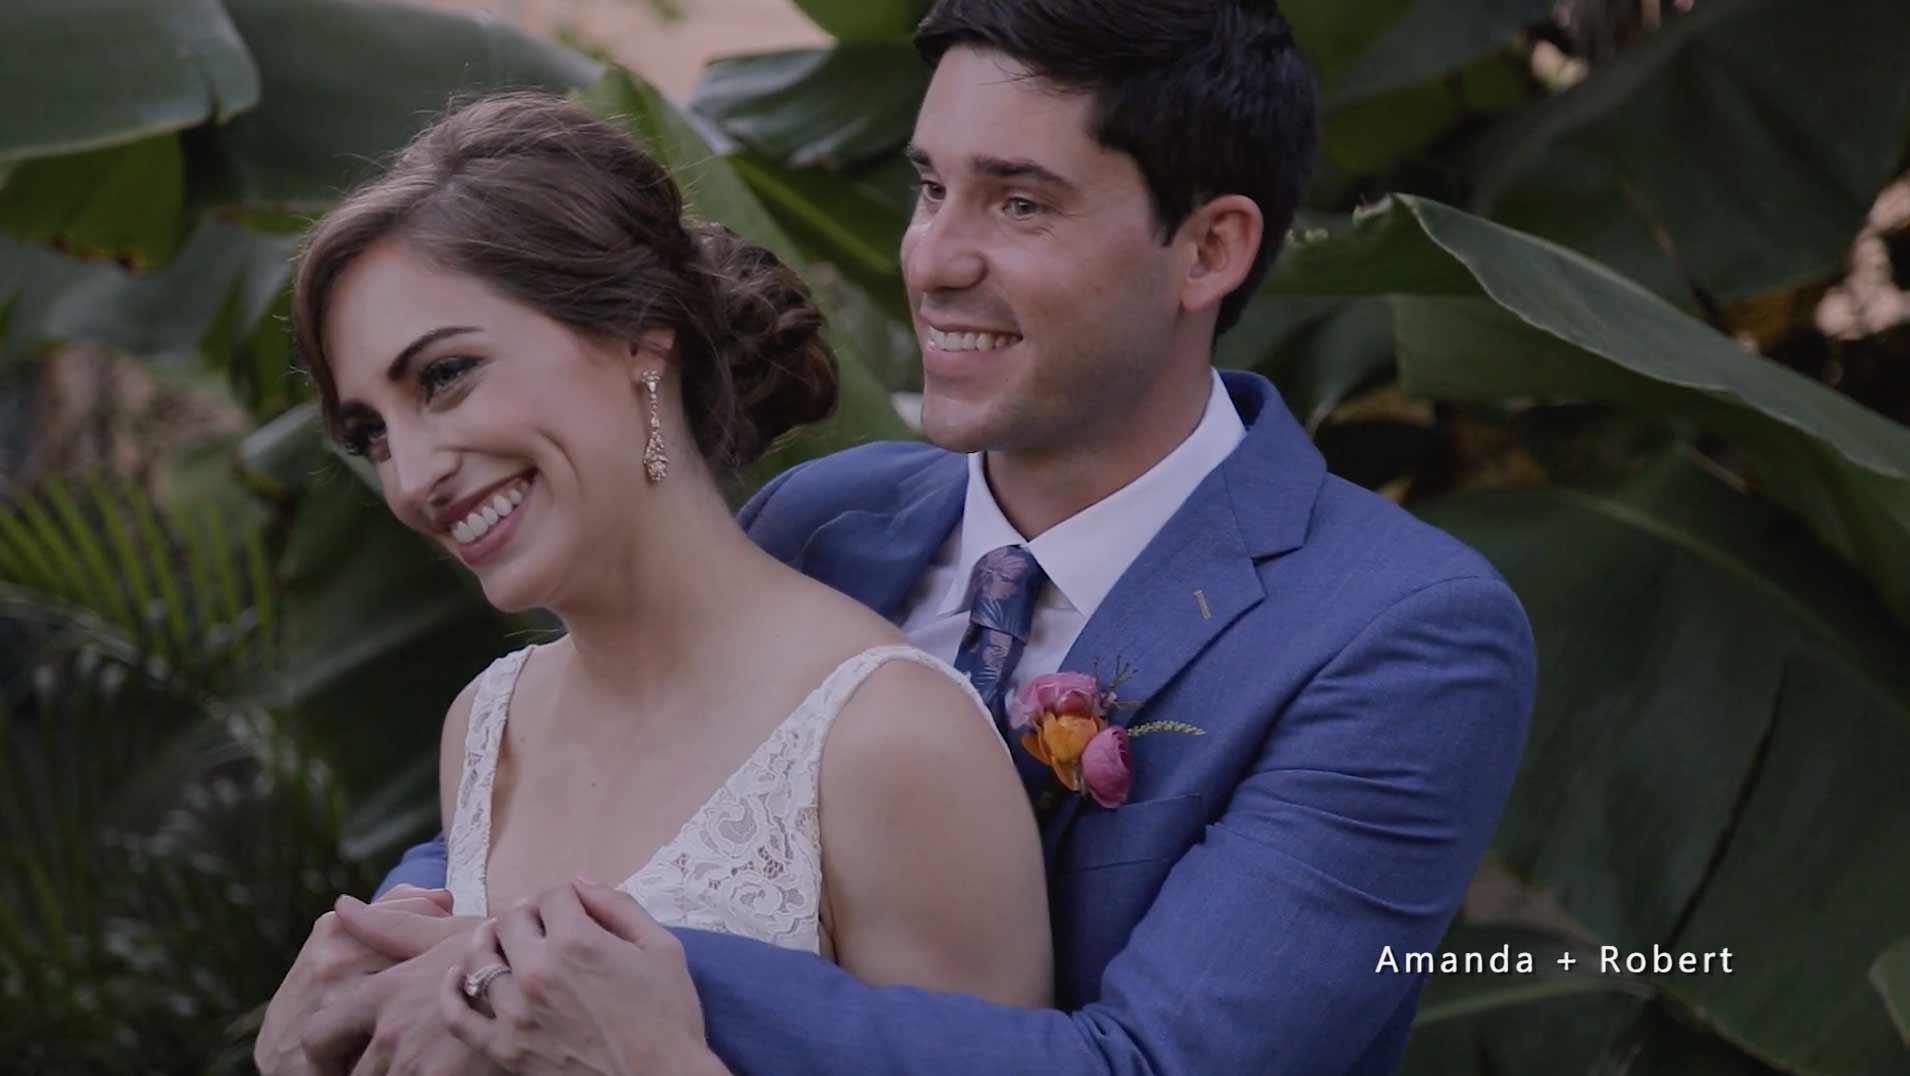 Amanda + Robert